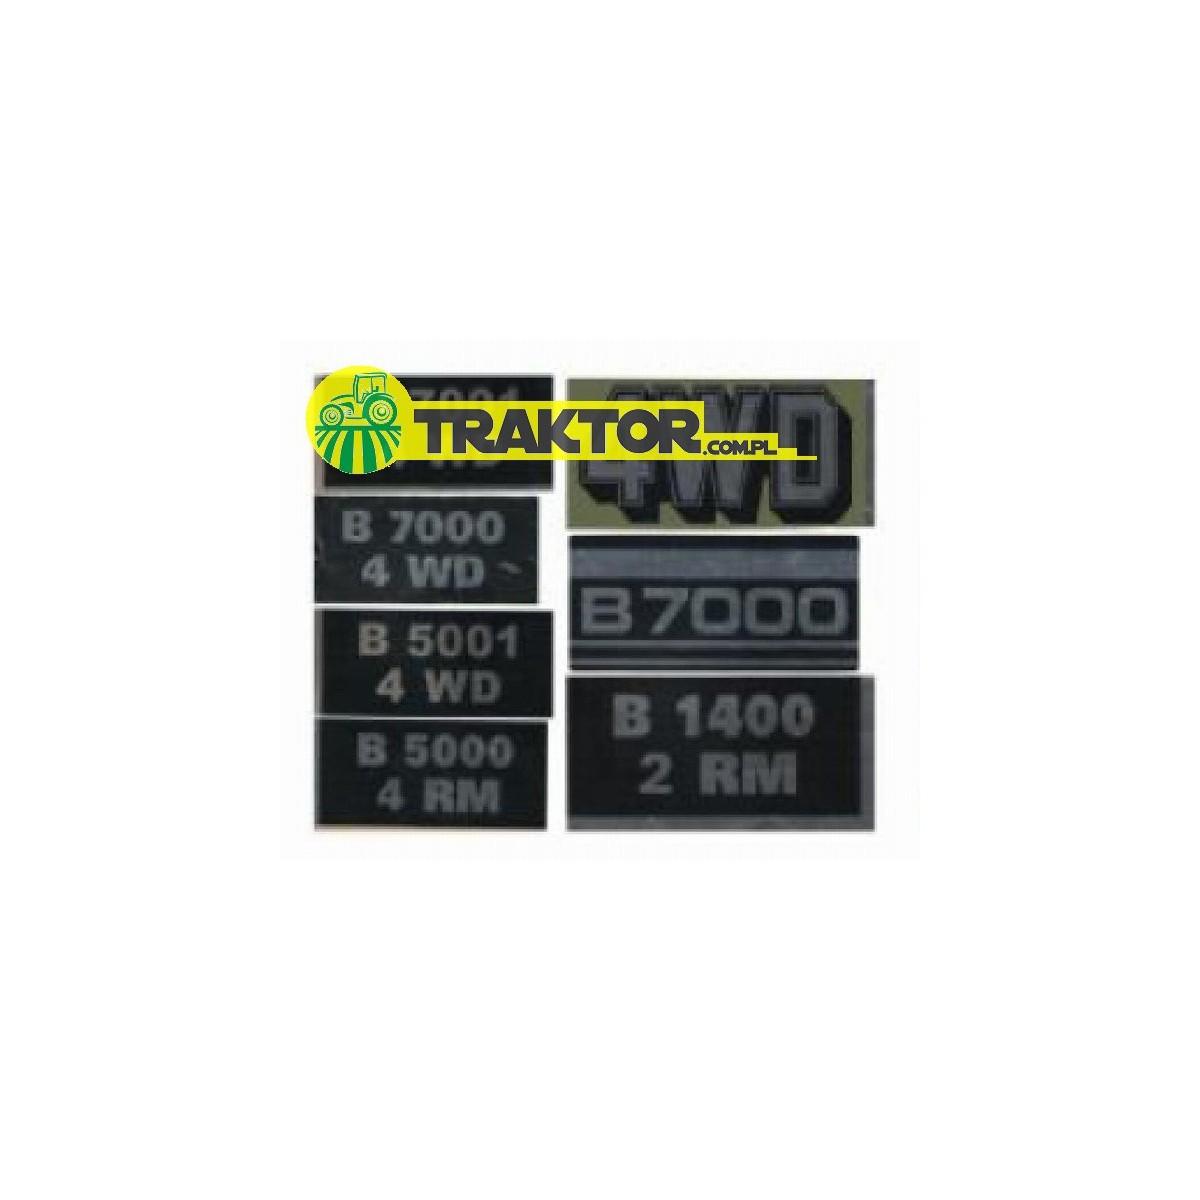 Aufkleber KUBOTA B7000, B7001, B5000, B5001, B6001, 4WD (7 Modelle)